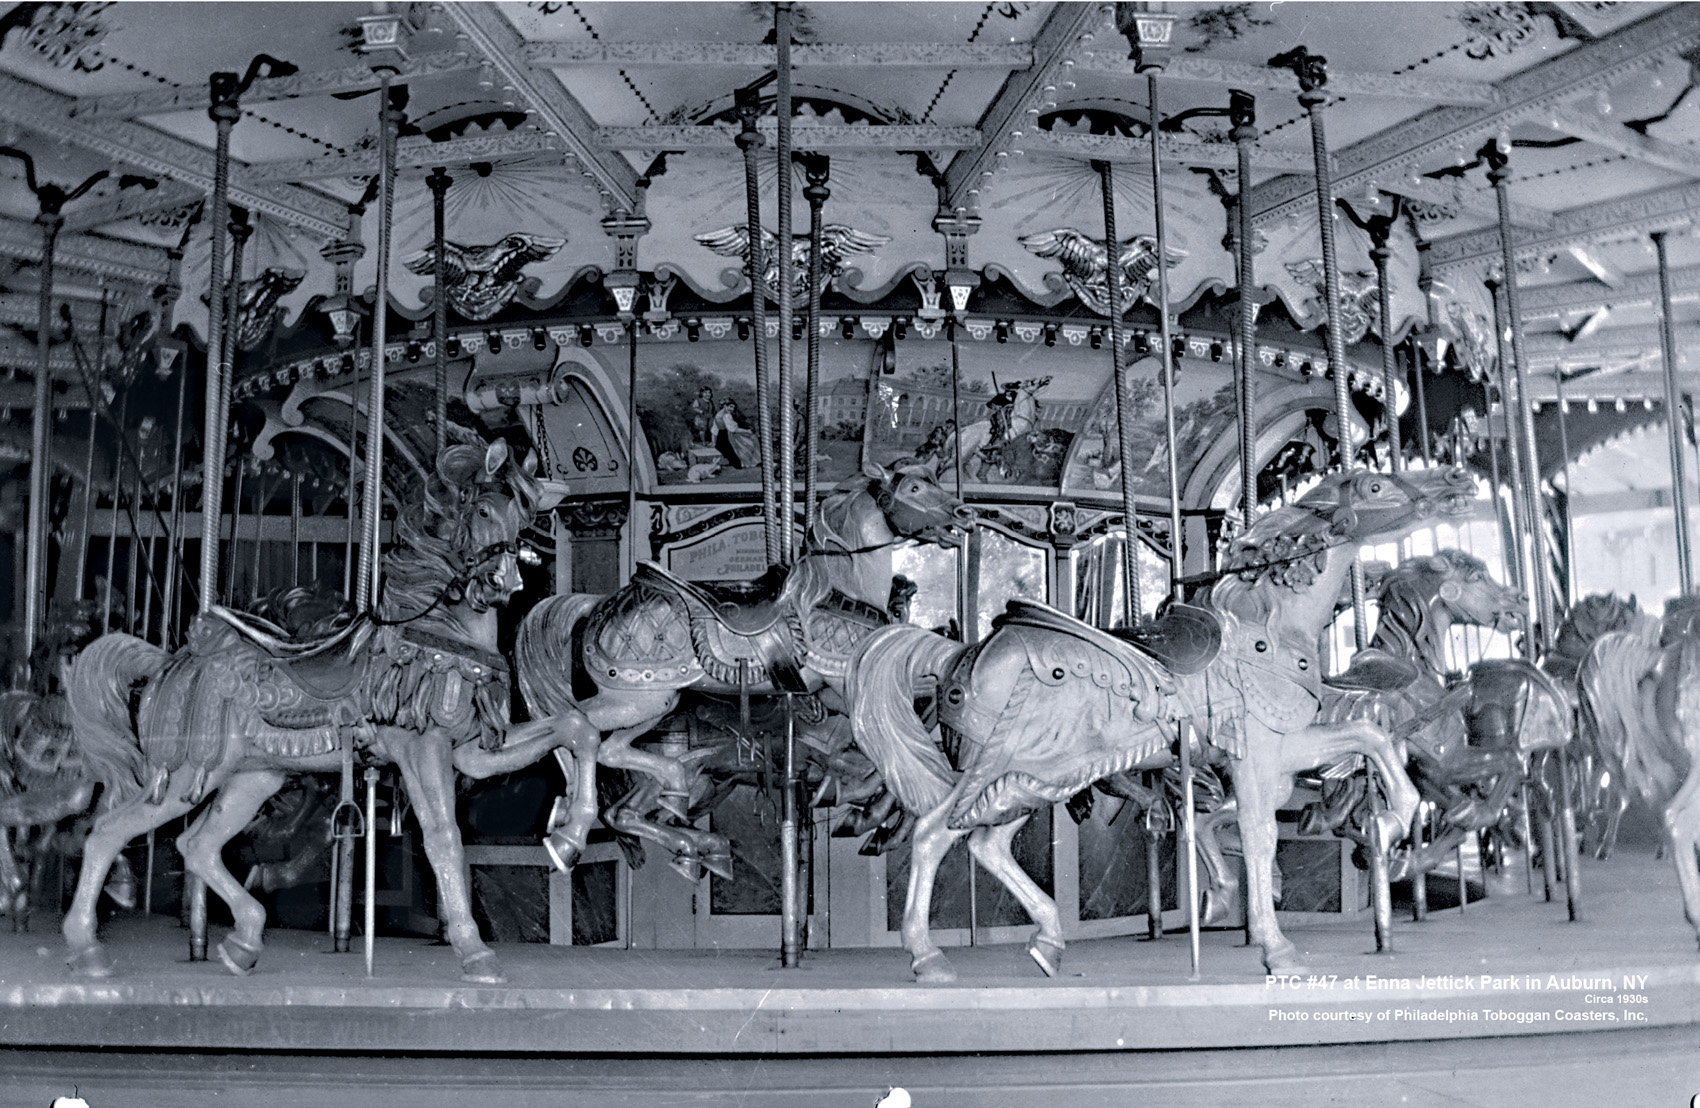 Historic-PTC-47-carousel-Enna-Jettick-Park-Auburn-NY-CNT-center-Jun-07